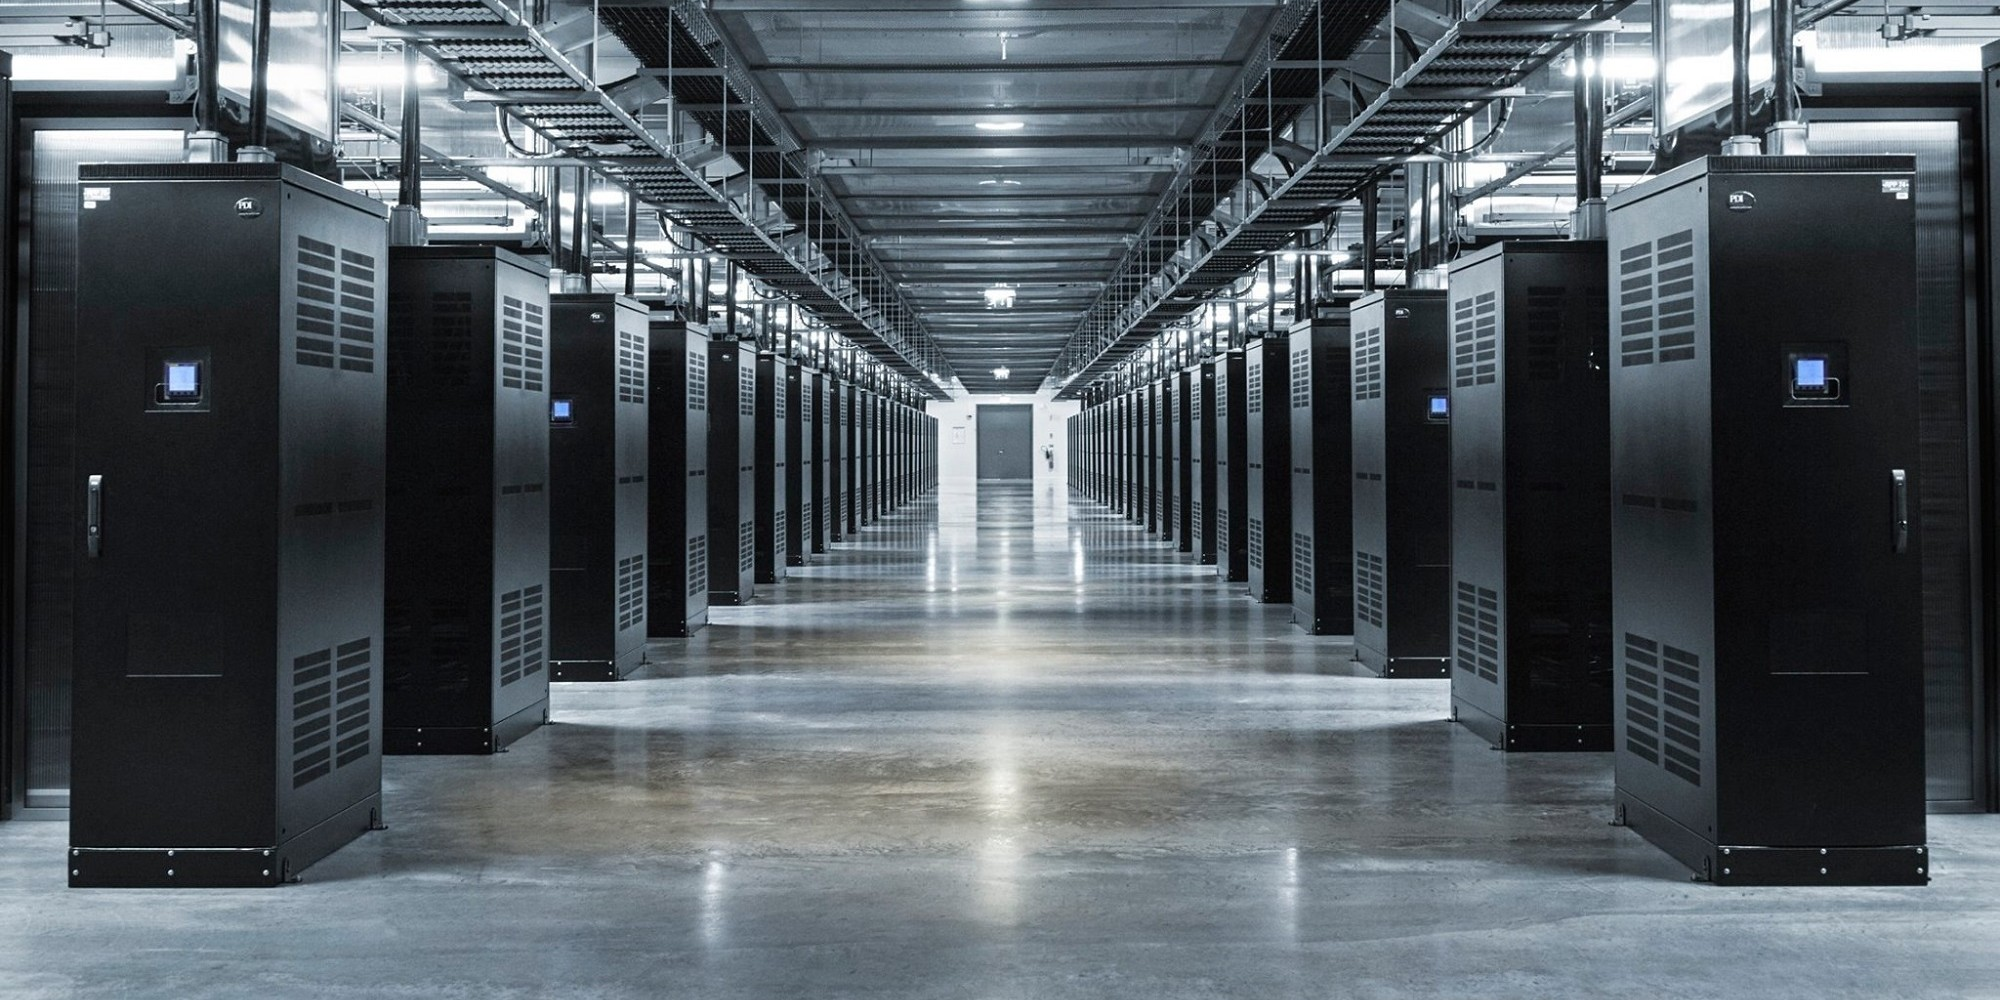 Les administrations publiques victimes d'infrastructures informatiques obsolètes